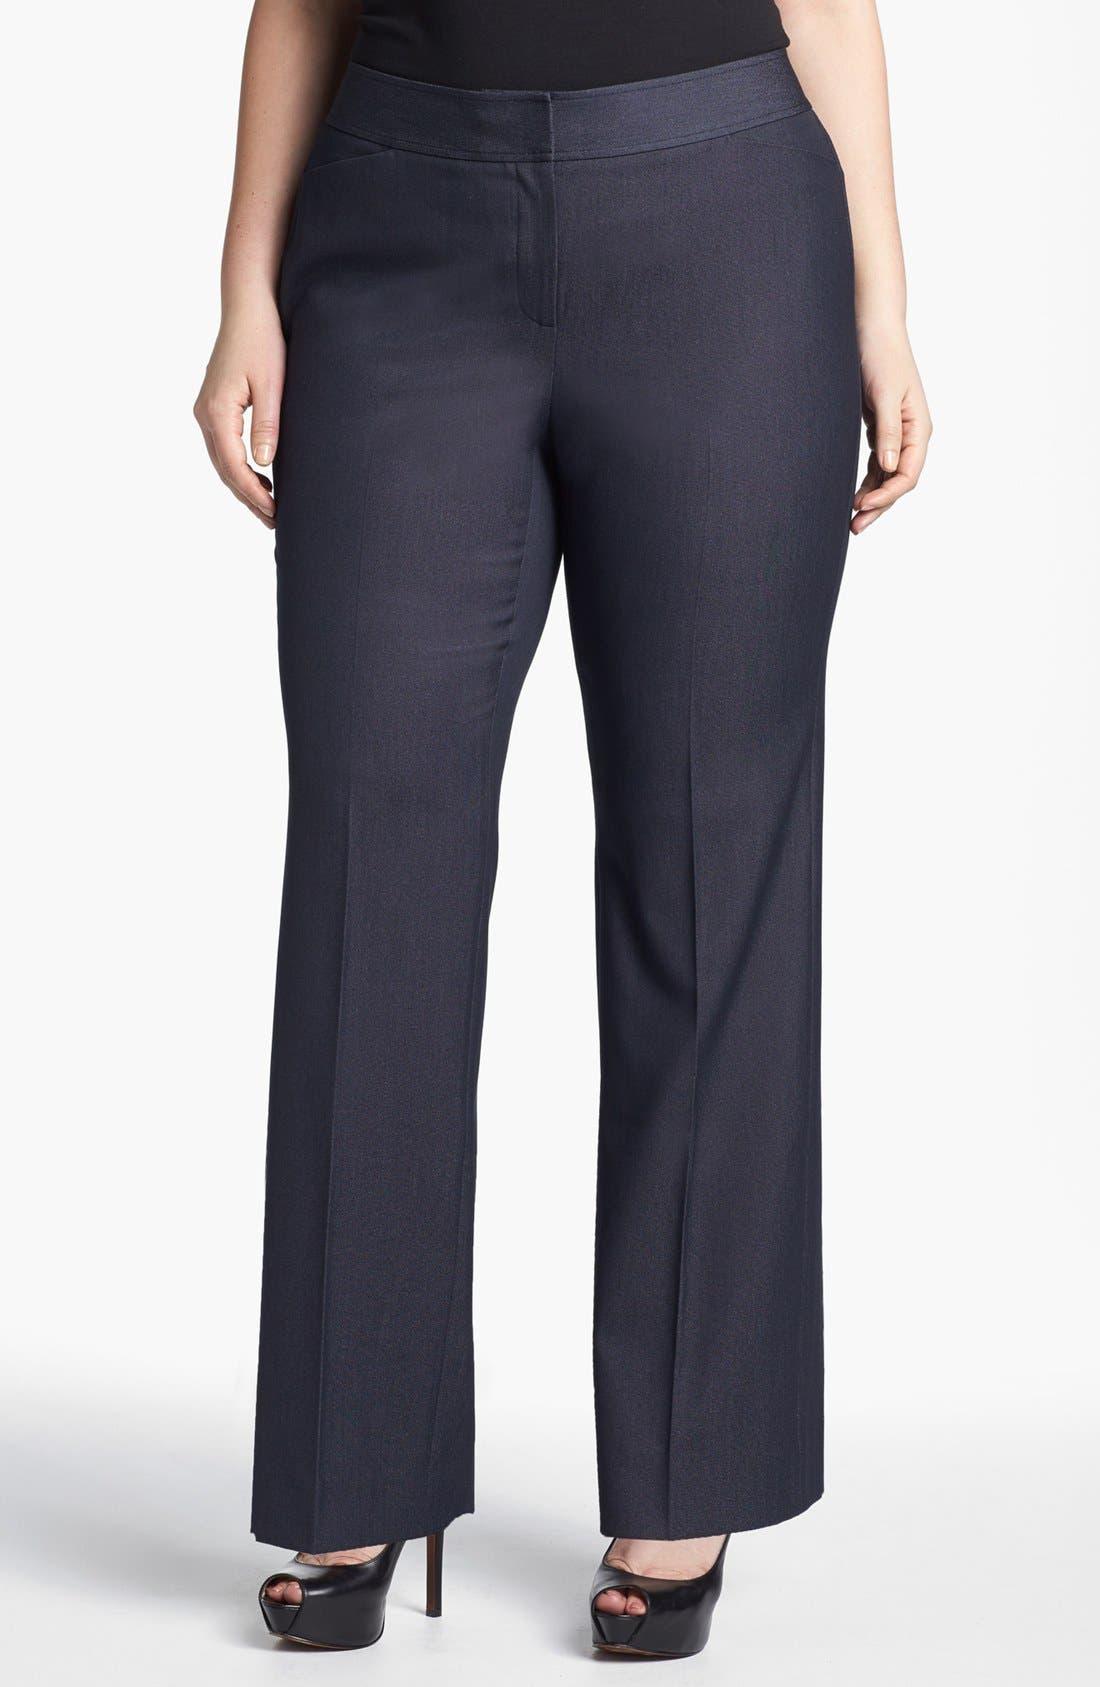 Alternate Image 1 Selected - Sejour 'Polished Indigo' Suit Trousers (Plus Size)